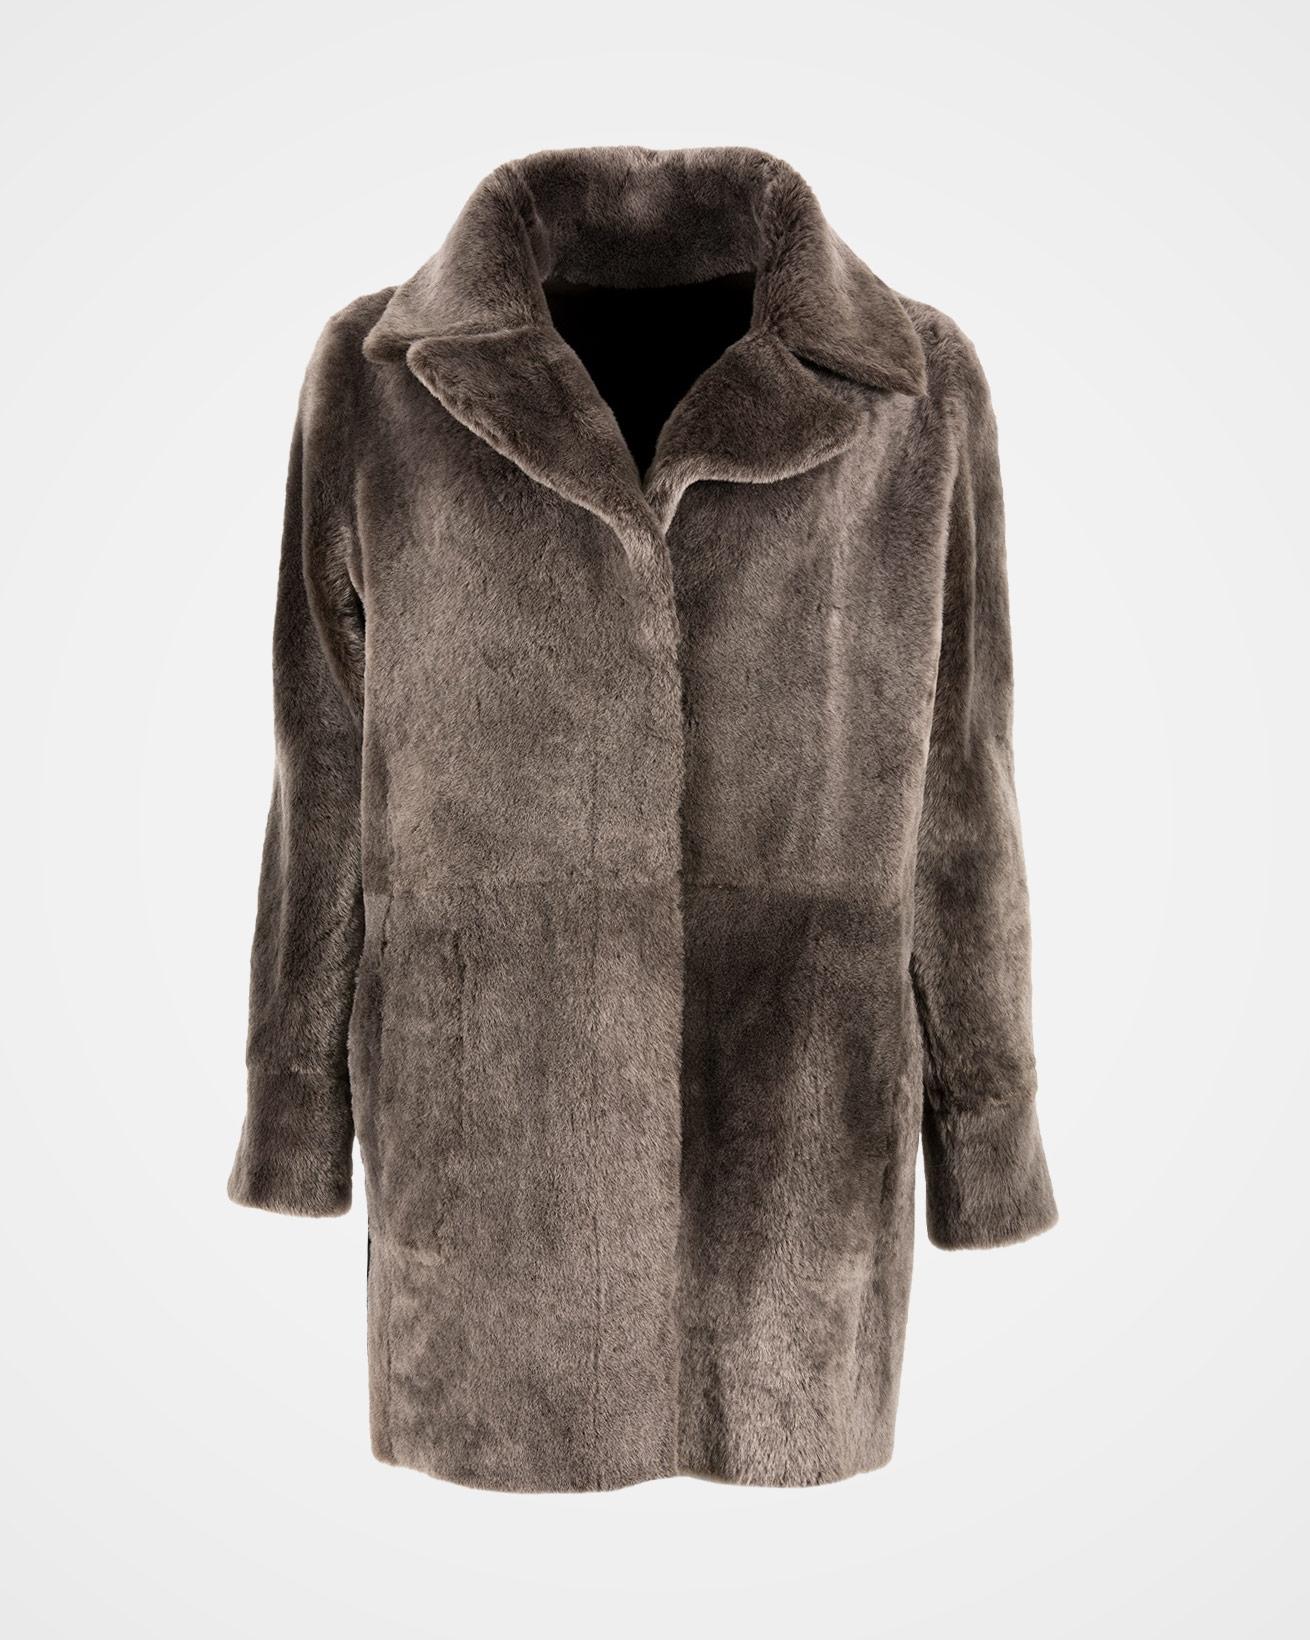 7501_sheepskin-city-coat_dark-nutmeg_front2.jpg